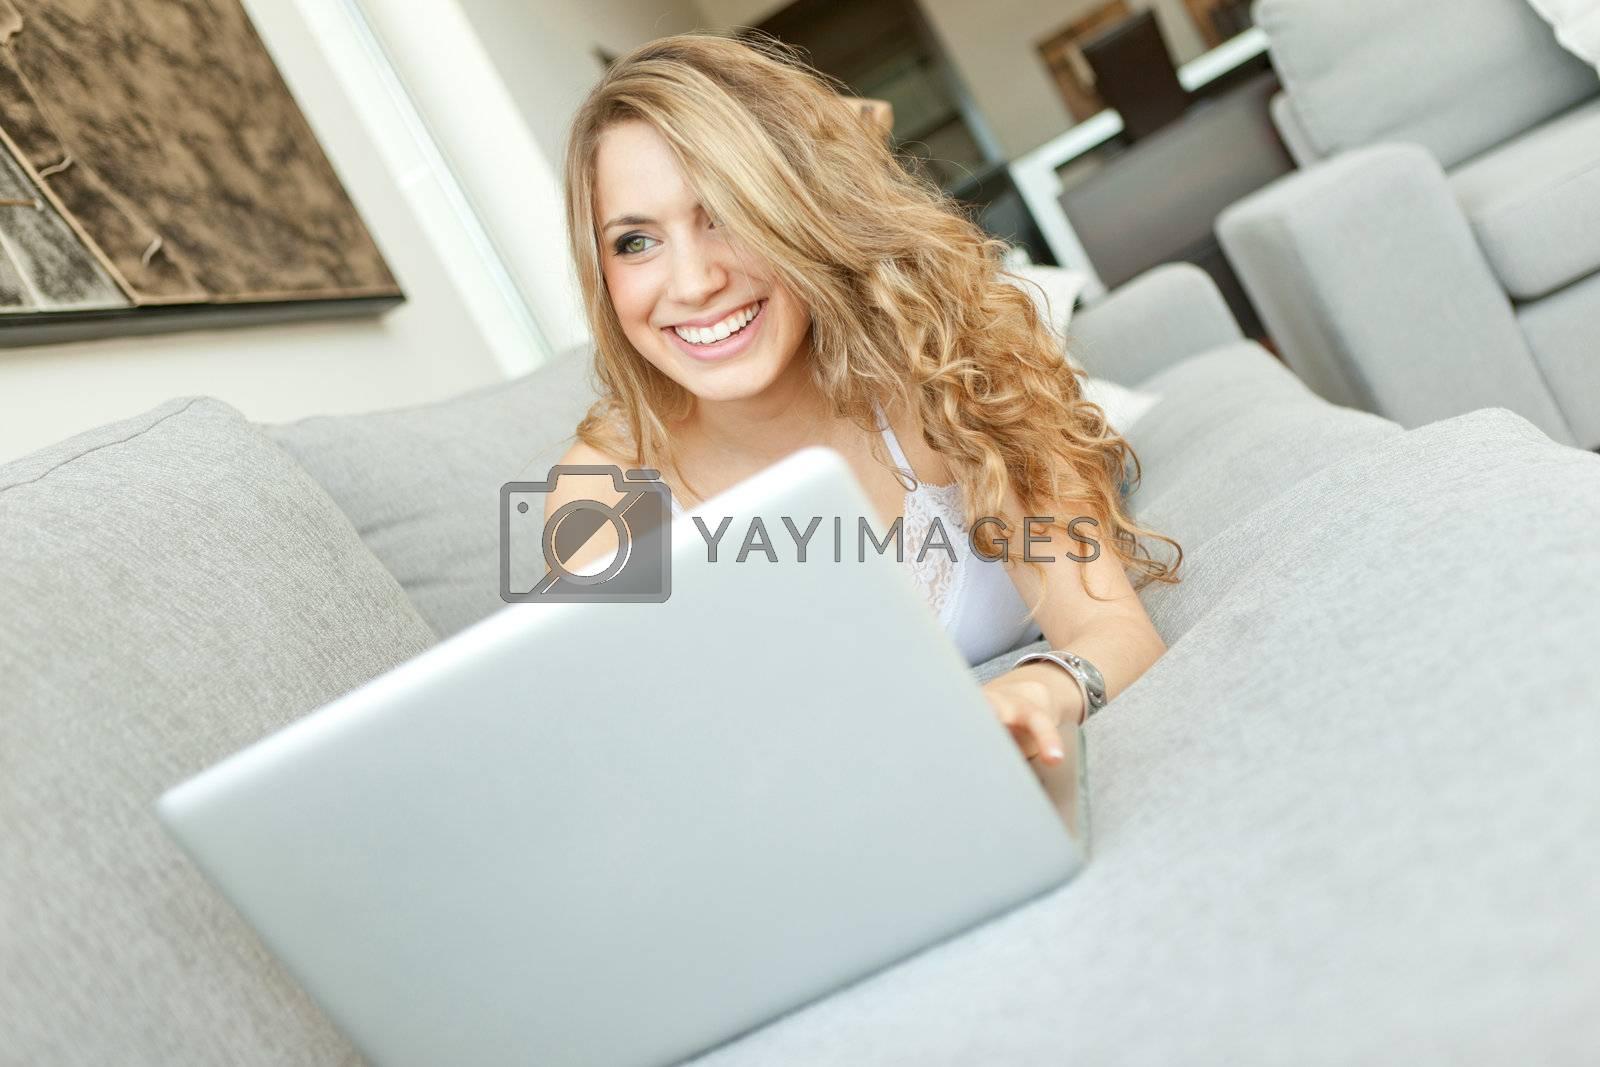 young beautiful woman using laptop computer